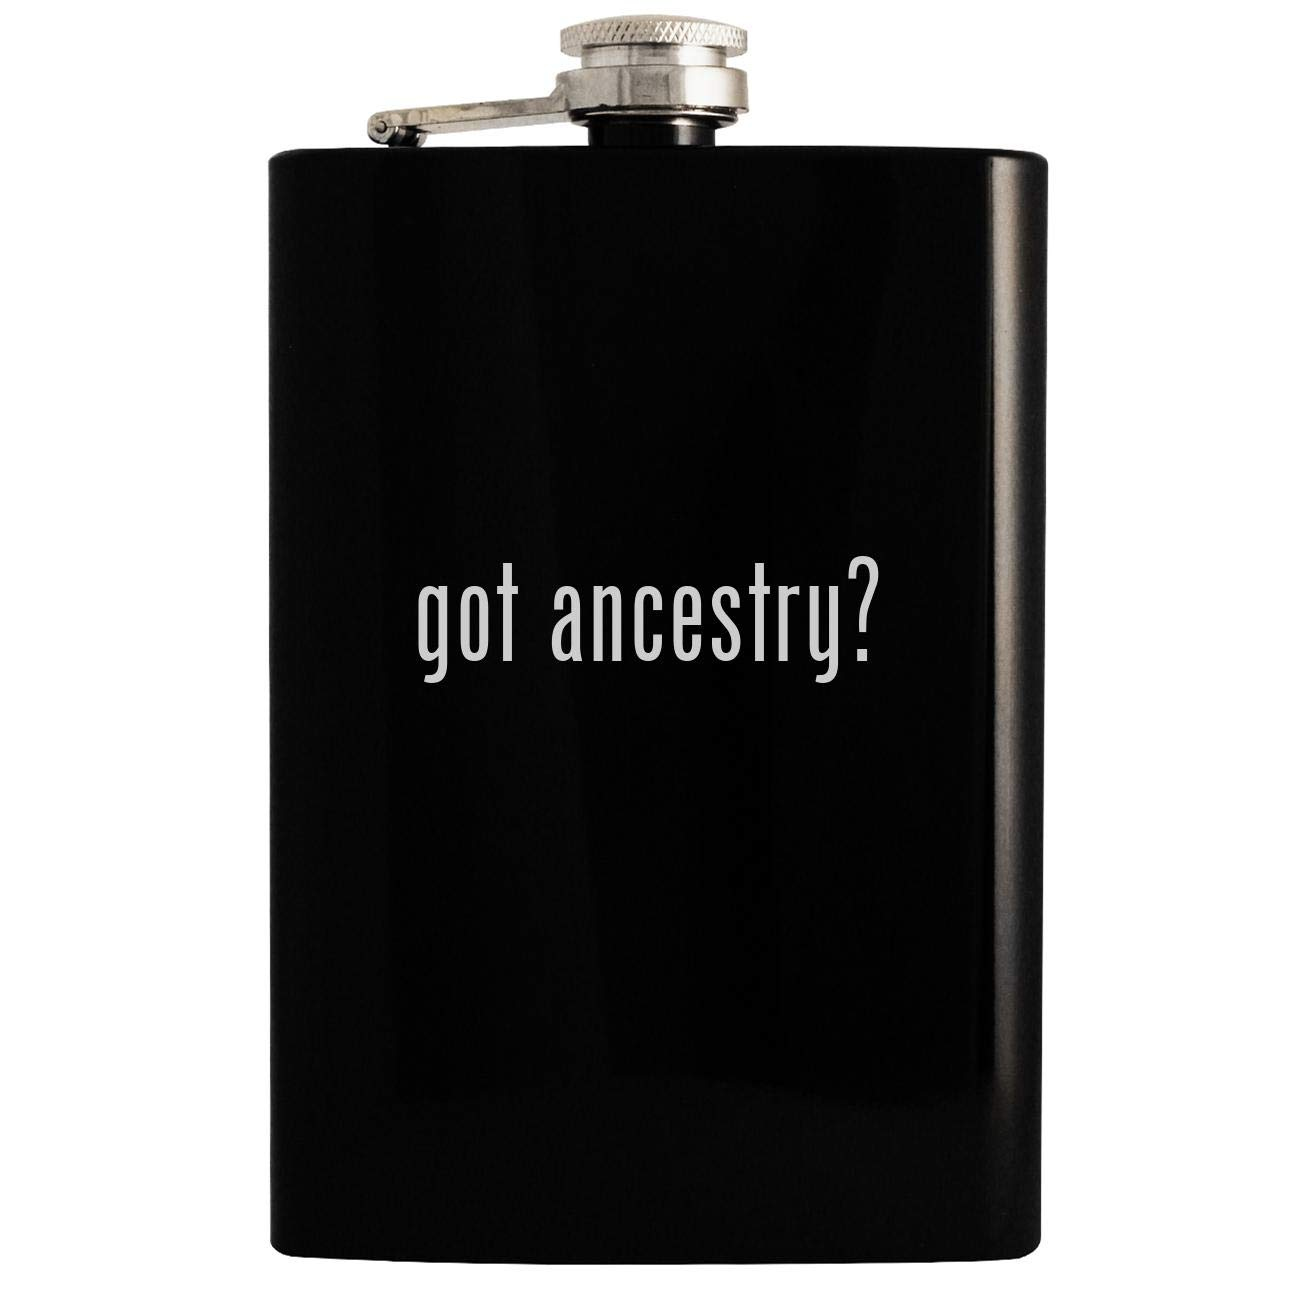 got ancestry? - Black 8oz Hip Drinking Alcohol Flask